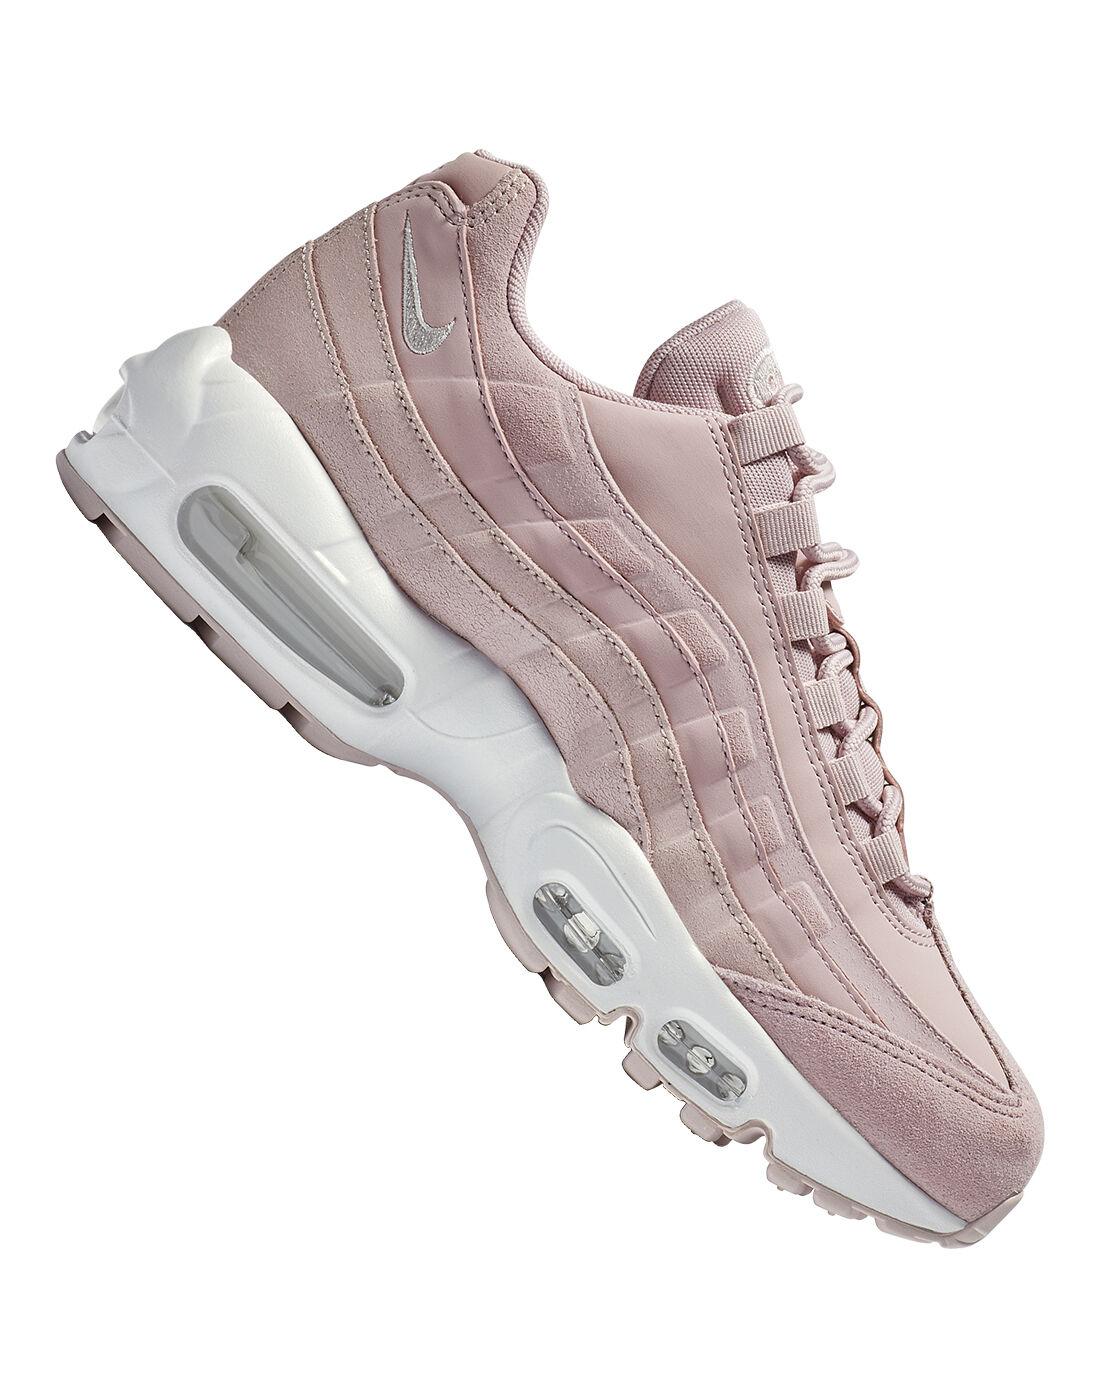 nike air max 95 women's pink